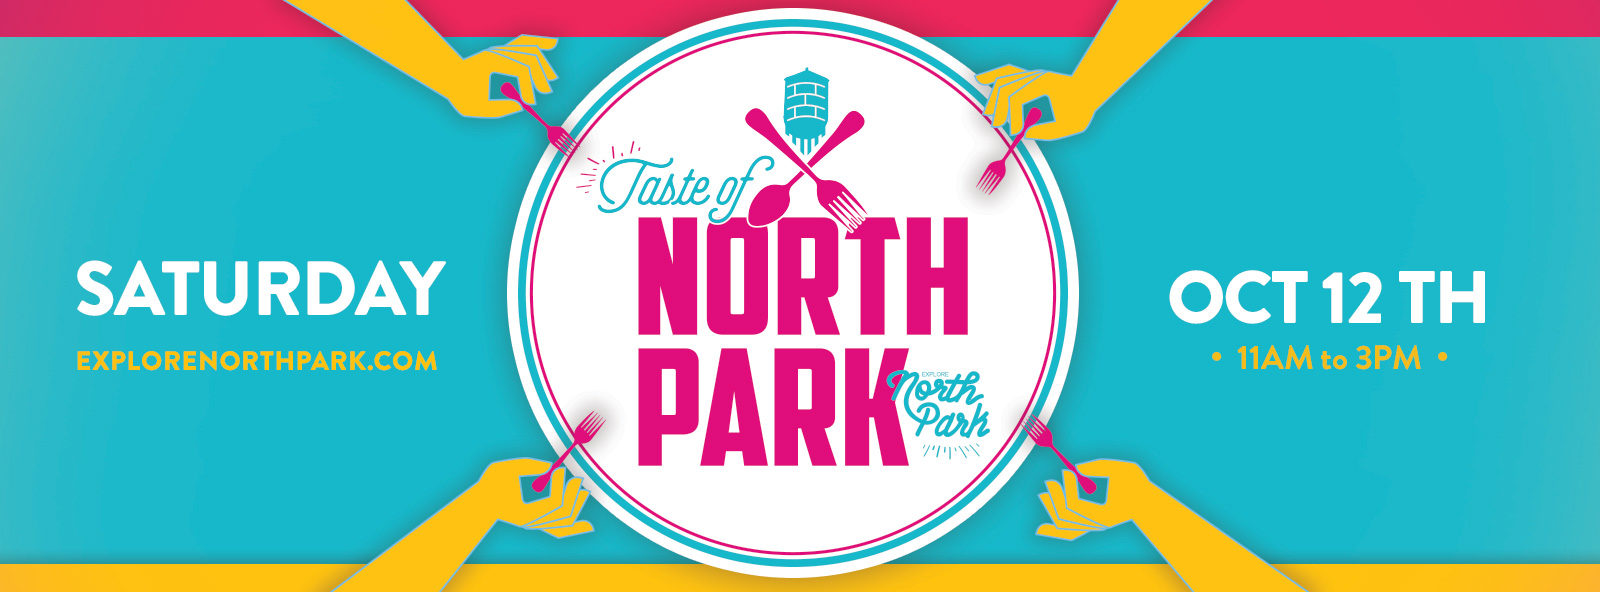 taste of north park explore north park